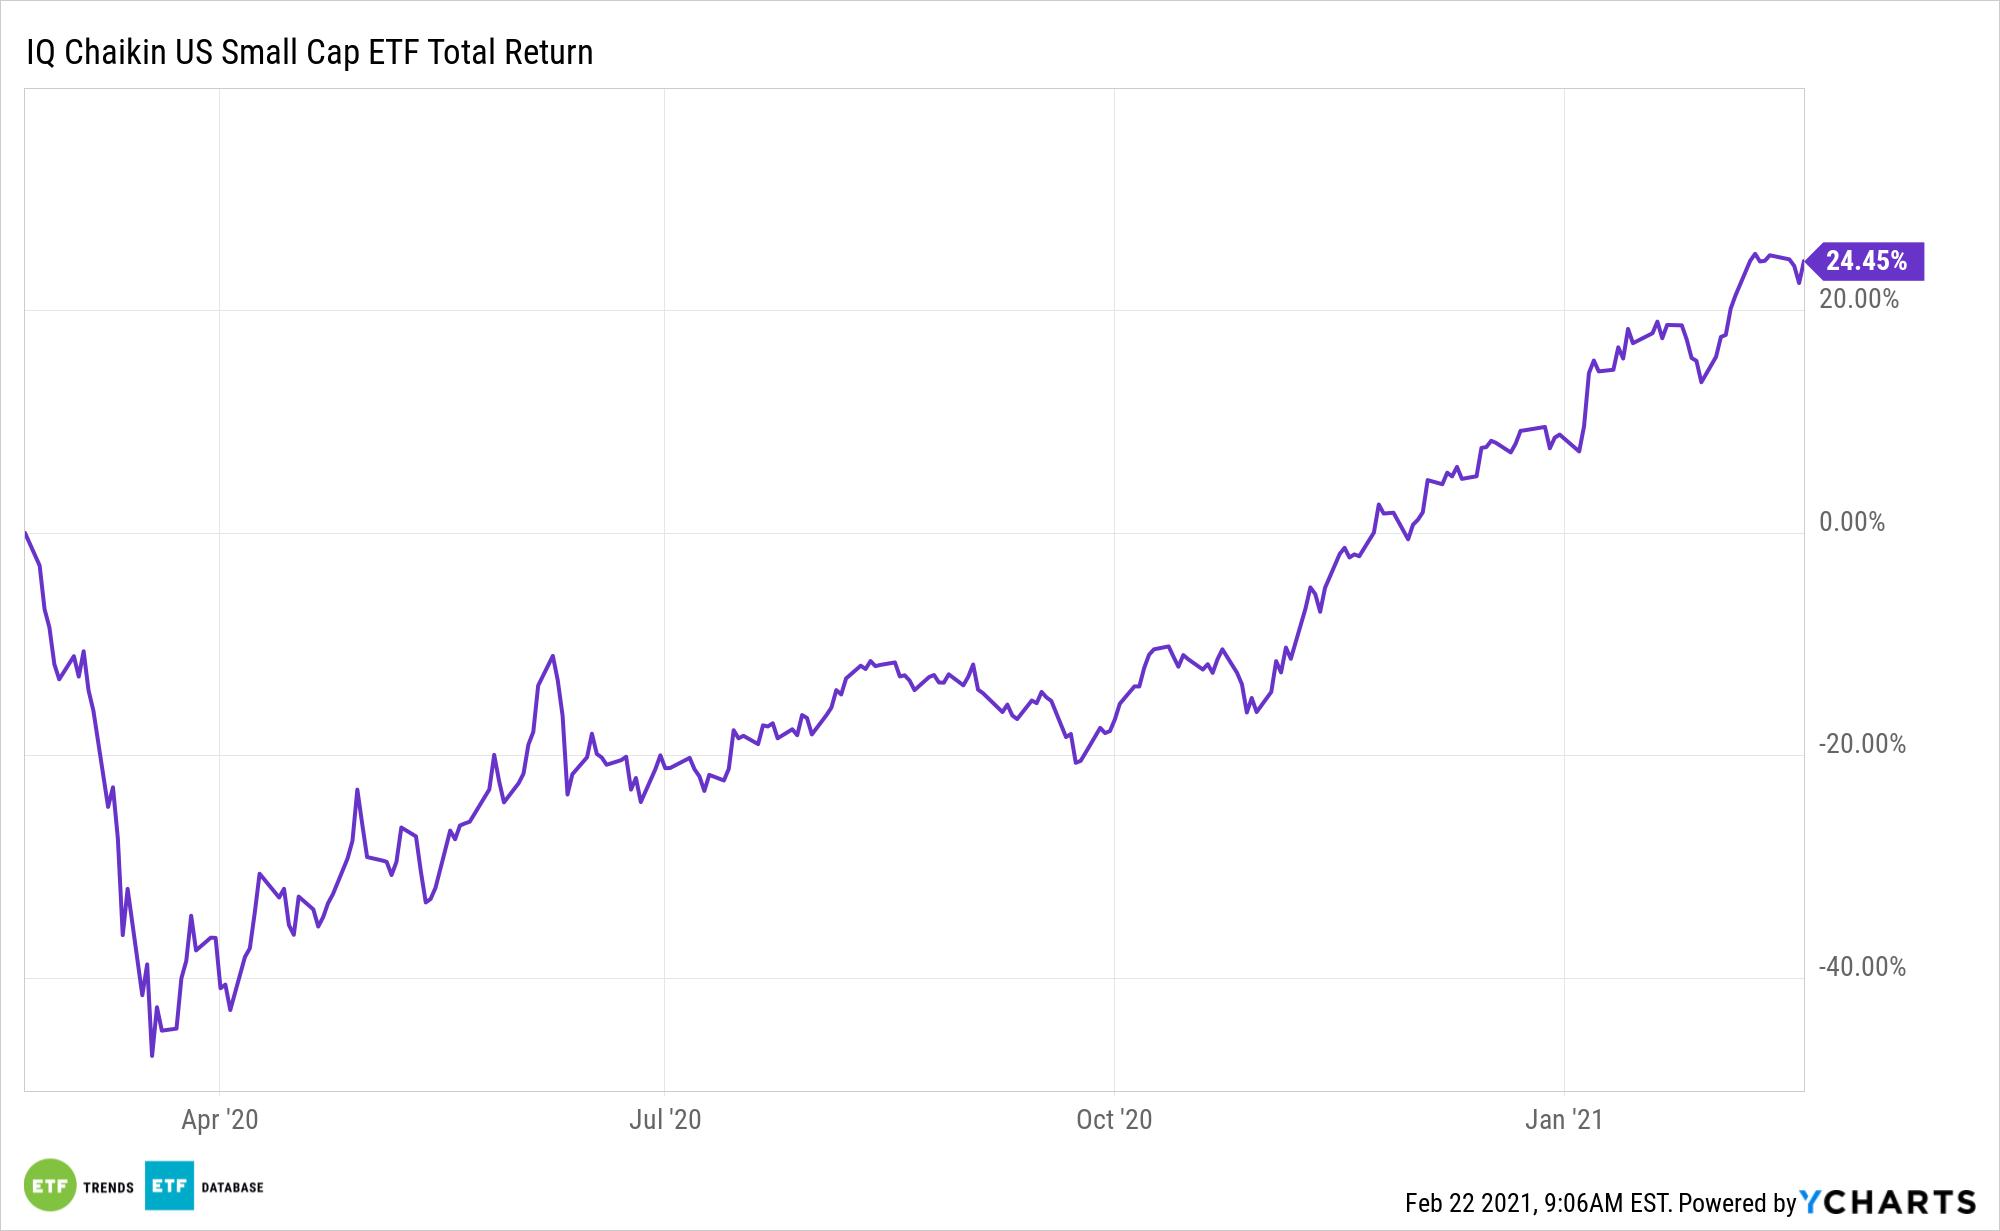 CSML 1 Year Total Return